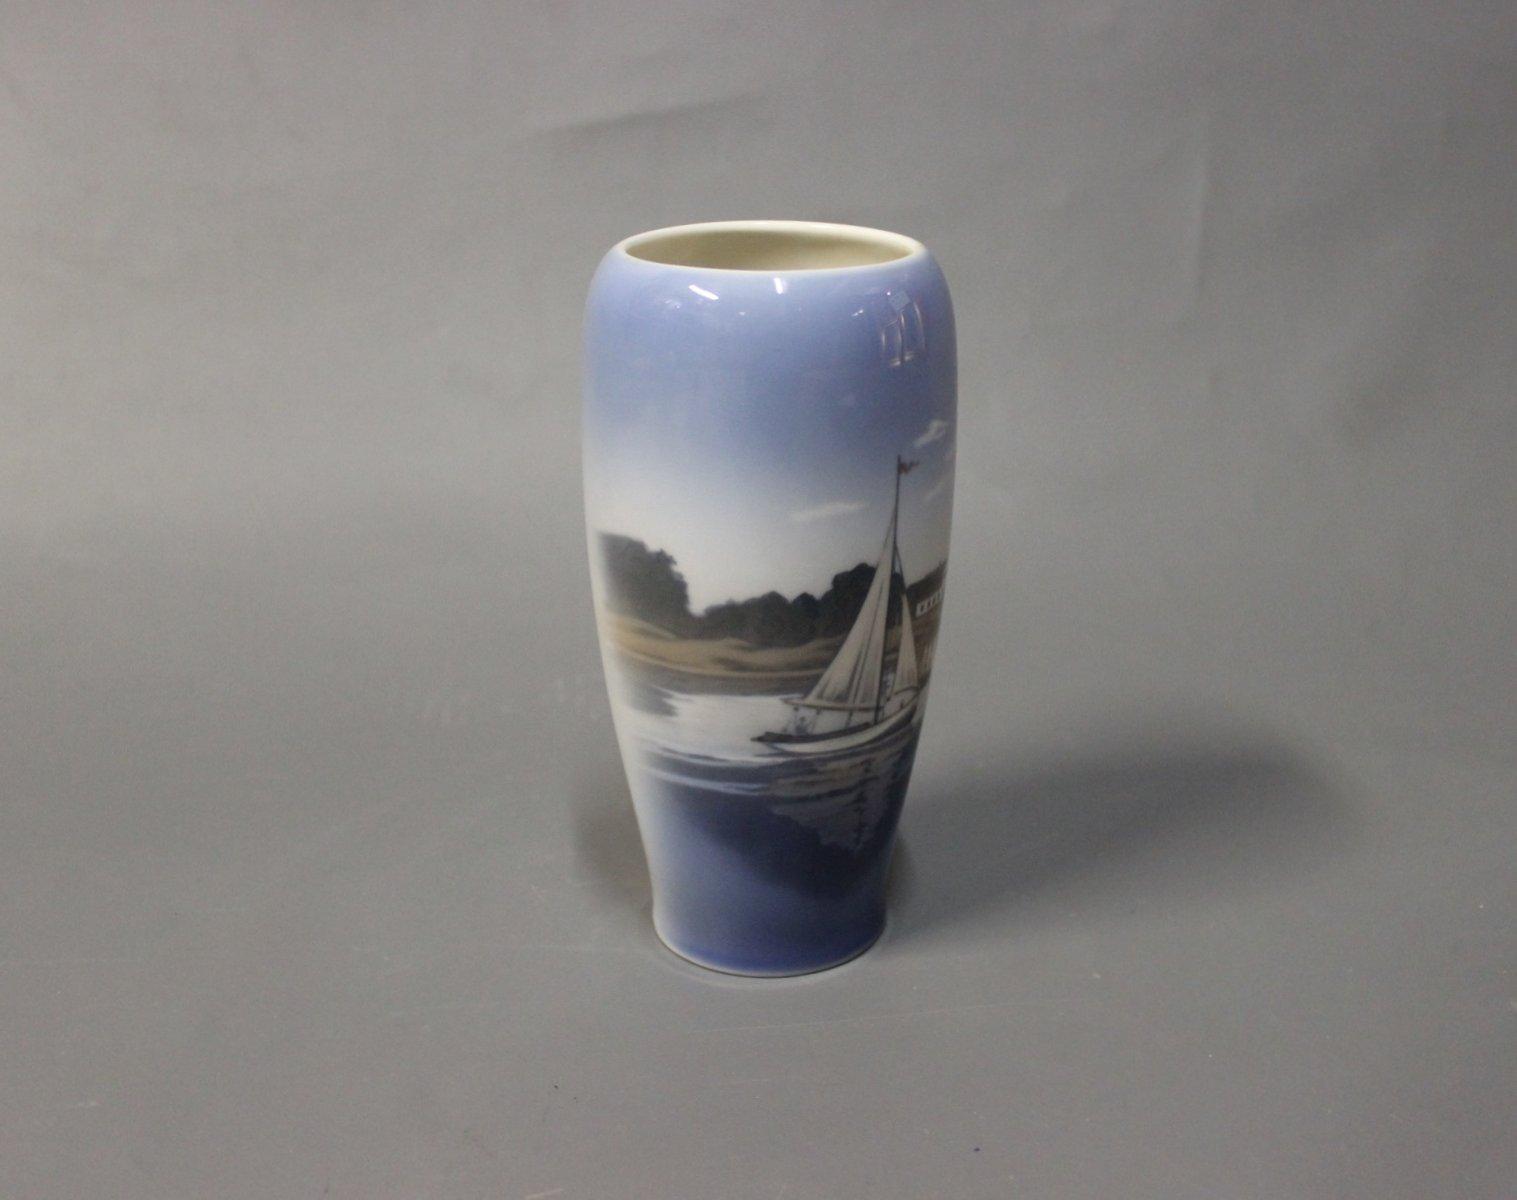 Danish harbor motif vase from royal copenhagen 1980s for sale at danish harbor motif vase from royal copenhagen 1980s reviewsmspy